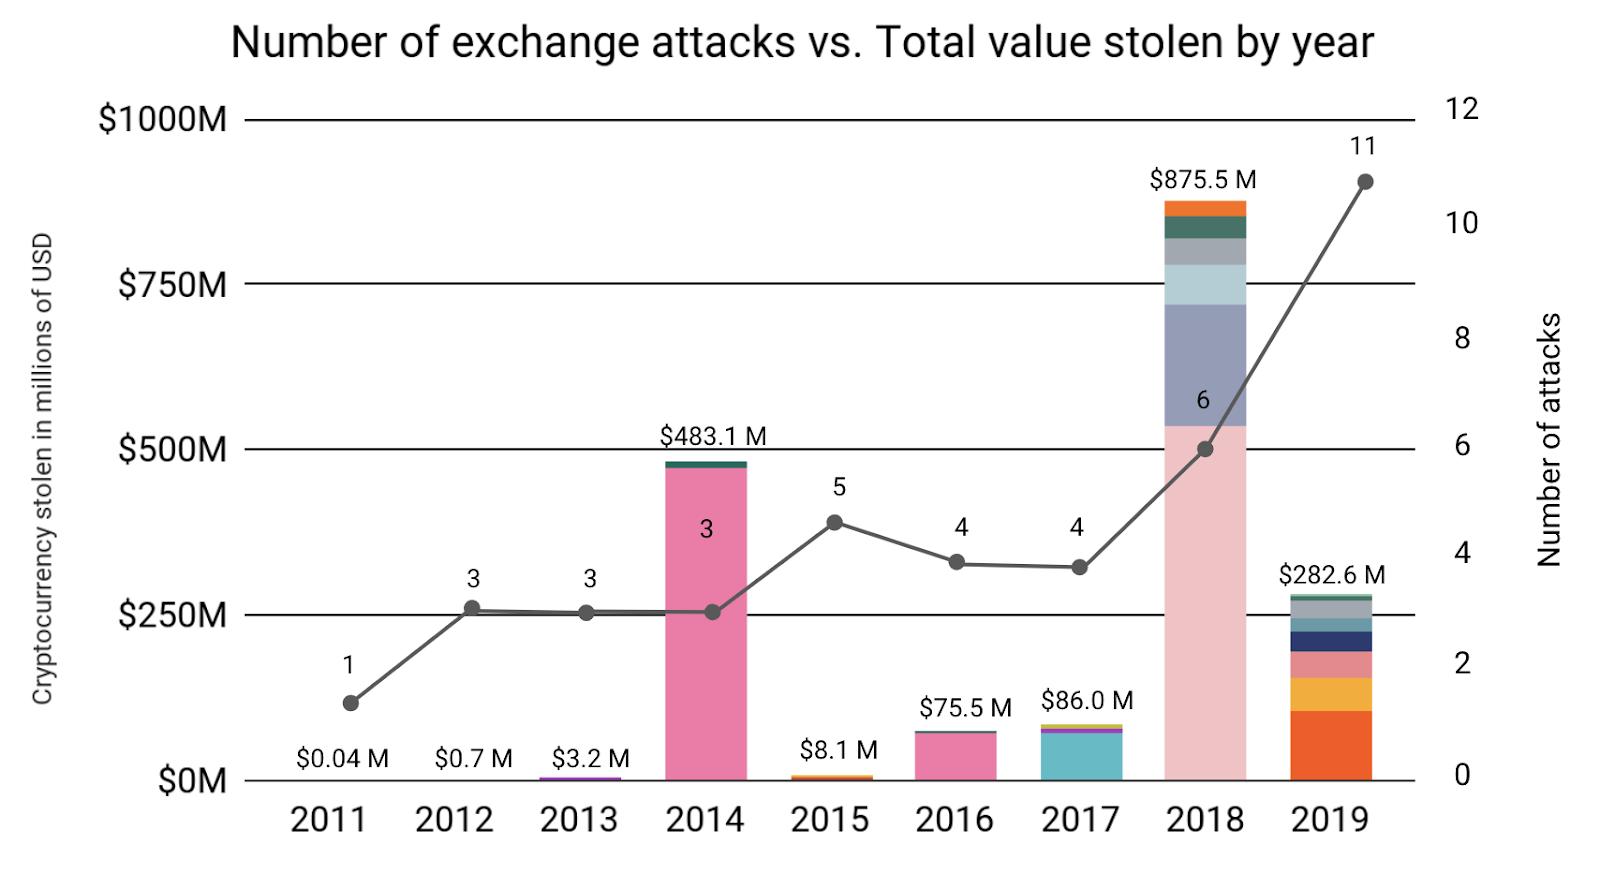 "Los datos muestran un valor de $ 25 mil millones en Bitcoin y Ether mantenidos por siete intercambios de cifrado ""width ="" 1600 ""height ="" 875 ""srcset ="" https://news.bitcoin.com/wp- content / uploads / 2020/01 / 5e26153e0f23b4ce7add5750_lshfvoeotxeo8coz_s6wu-cuj4rlz76trfxgnfy-etad60y0dzmehdxtc_ubxlm6z9qrmqjpq0upevu3jh3t3clscpkxo2ybmr4sbfbm1h0twaunbecmrh3vb_imogiaduutjbi-.png 1600w, https://news.bitcoin.com/wp-content/uploads/2020/01/5e26153e0f23b4ce7add5750_lshfvoeotxeo8coz_s6wu-cuj4rlz76trfxgnfy-etad60y0dzmehdxtc_ubxlm6z9qrmqjpq0upevu3jh3t3clscpkxo2ybmr4sbfbm1h0twaunbecmrh3vb_imogiaduutjbi--300x164.png 300w, https://news.bitcoin.com/wp-content/uploads/2020/01/5e26153e0f23b4ce7add5750_lshfvoeotxeo8coz_s6wu-cuj4rlz76trfxg nfy-etad60y0dzmehdxtc_ubxlm6z9qrmqjpq0upevu3jh3t3clscpkxo2ybmr4sbfbm1h0twaunbecmrh3vb_imogiaduutjbi - 1024x560.png 1024w, https://news.bitcoin.com/wp-content/uploads/2020/01/5e26153e0f23b4ce7add5750_lshfvoeotxeo8coz_s6wu-cuj4rlz76trfxgnfy-etad60y0dzmehdxtc_ubxlm6z9qrmqjpq0upevu3jh3t3clscpkxo2ybmr4sbfbm1h0twaunbecmrh3vb_imogiaduutjbi--768x420.png 768w, https: //news.bitcoin. com / wp-content / uploads / 2020/01 / 5e26153e0f23b4ce7add5750_lshfvoeotxeo8coz_s6wu-cuj4rlz76trfxgnfy-etad60y0dzmehdxtc_ubxlm6z9qrmqjpq0upevu3jh3t3clscpkxo2ybmr4sbfbm1h0twaunbecmrh3vb_imogiaduutjbi - 1536x840.png 1536w, https://news.bitcoin.com/wp-content/uploads/2020/01/5e26153e0f23b4ce7add5750_lshfvoeotxeo8coz_s6wu-cuj4rlz76trfxgnfy-etad60y0dzmehdxtc_ubxlm6z9qrmqjpq0upevu3jh3t3clscpkxo2ybmr4sbfbm1h0twaunbecmrh3vb_imogiaduutjbi- Ampliación de categoría de servicio. 1h0twaunbecmrh3vb_imogiaduutjbi - 1392x761.png 1392w, 1068w https://news.bitcoin.com/wp-content/uploads/2020/01/5e26153e0f23b4ce7add5750_lshfvoeotxeo8coz_s6wu-cuj4rlz76trfxgnfy-etad60y0dzmehdxtc_ubxlm6z9qrmqjpq0upevu3jh3t3clscpkxo2ybmr4sbfbm1h0twaunbecmrh3vb_imogiaduutjbi--1068x584.png ""tamaños ="" (max-width: 1600px) 100vw, 1600px"